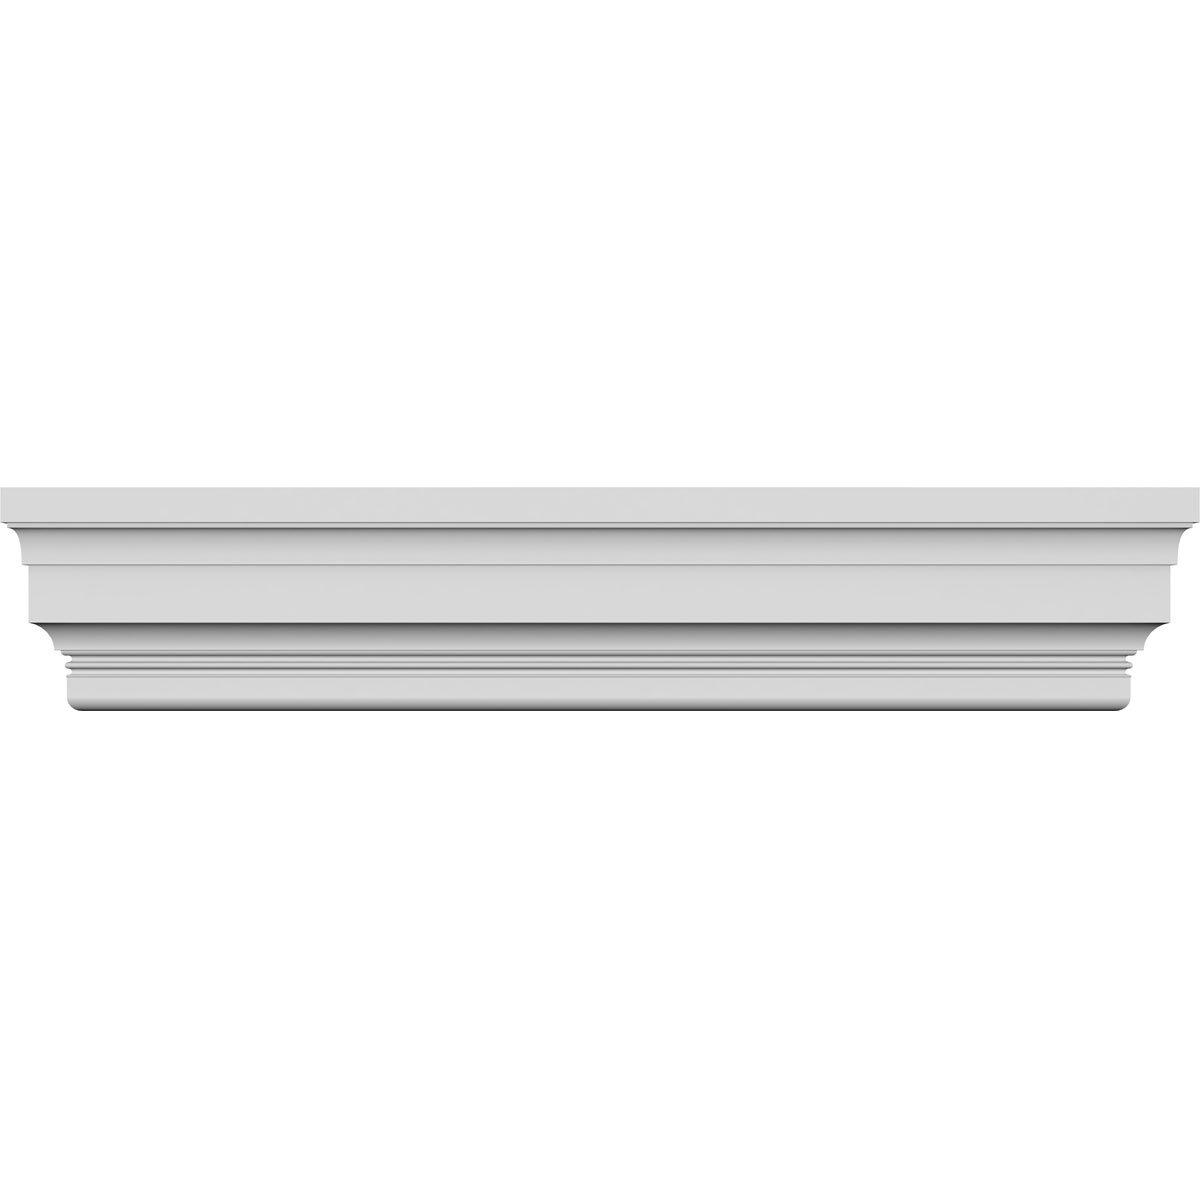 Ekena Millwork CRH12X78ST 78'' Bottom 83 3/4'' Top Width x 11 7/8'' H x 5/8'' P Standard Crosshead, Width Width, Factory Primed White by Ekena Millwork